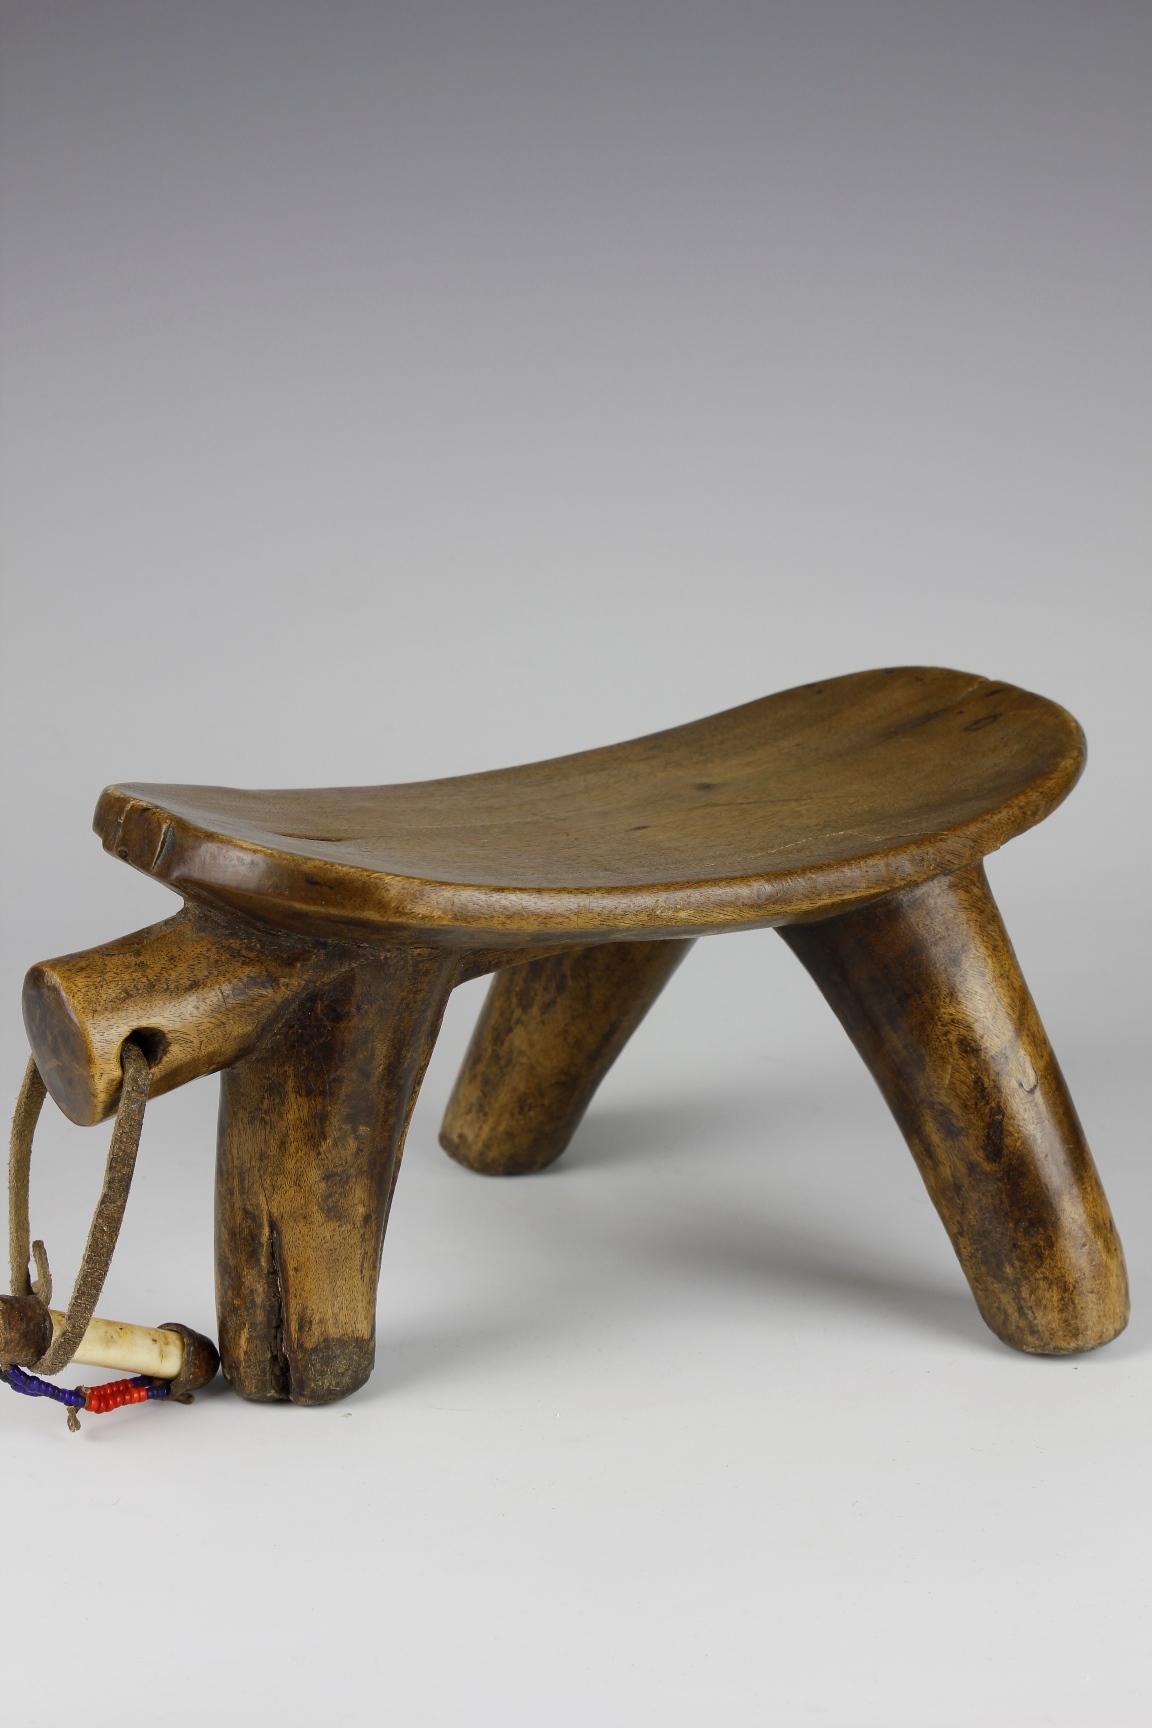 Headrest/Stool